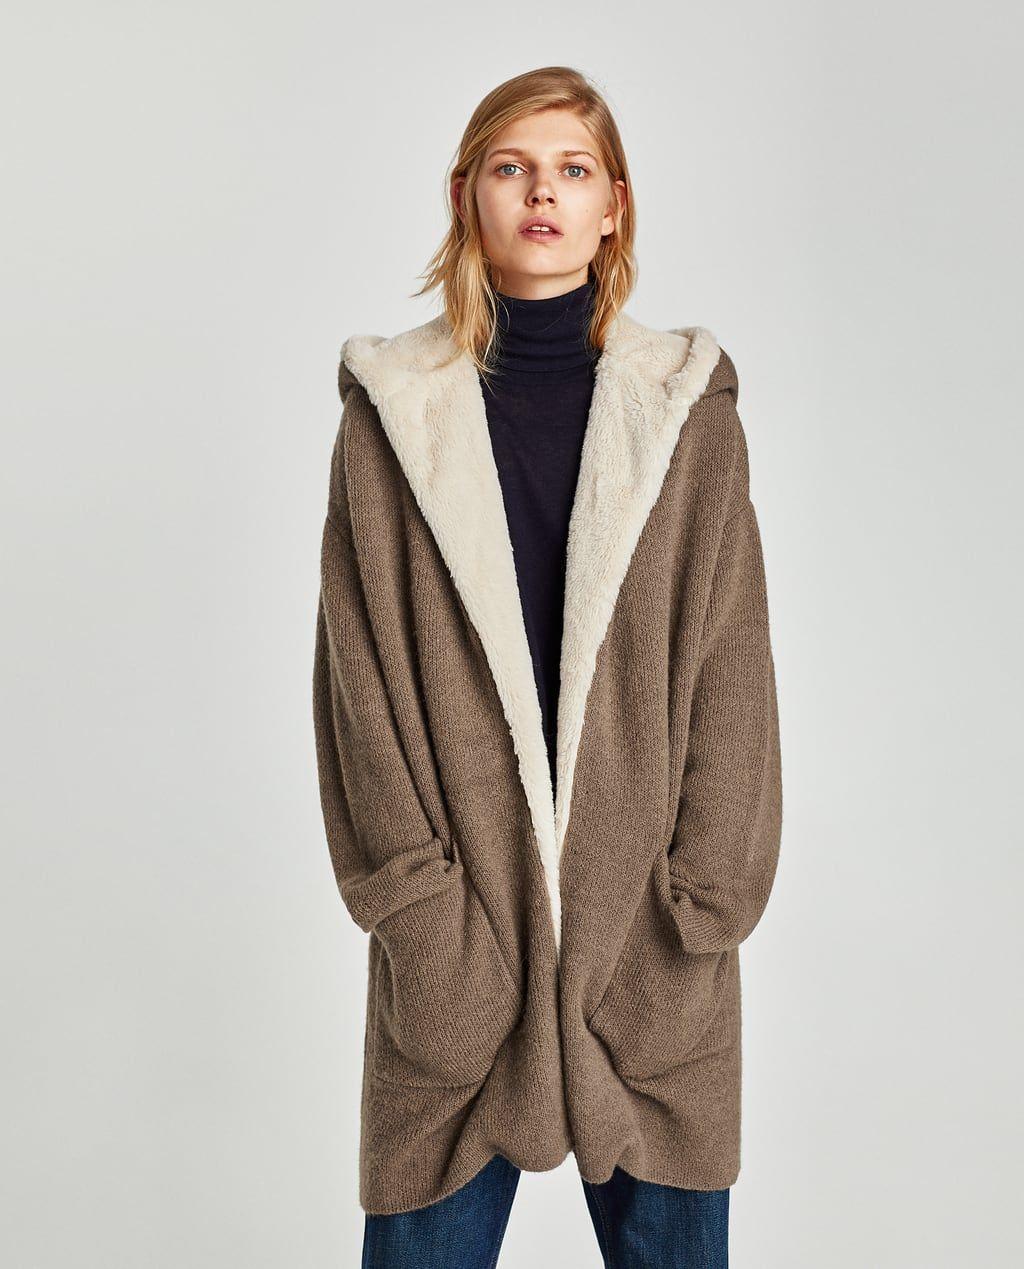 Faux fur sweater with metallic thread Jackets, Fashion